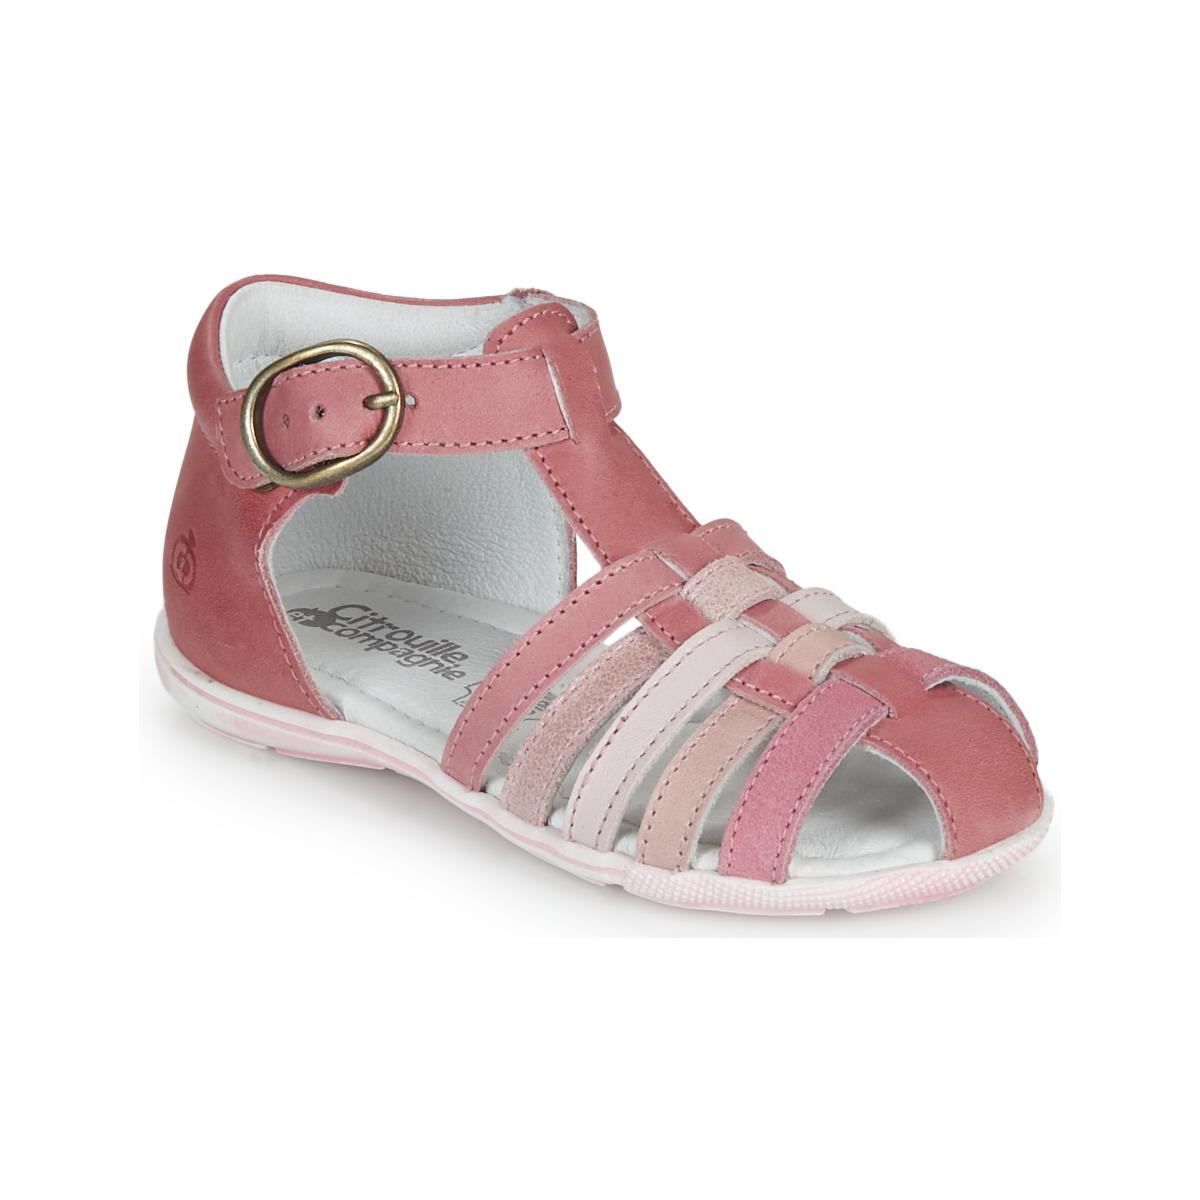 Sandale Citrouille et Compagnie RINE Rose / Multicolore